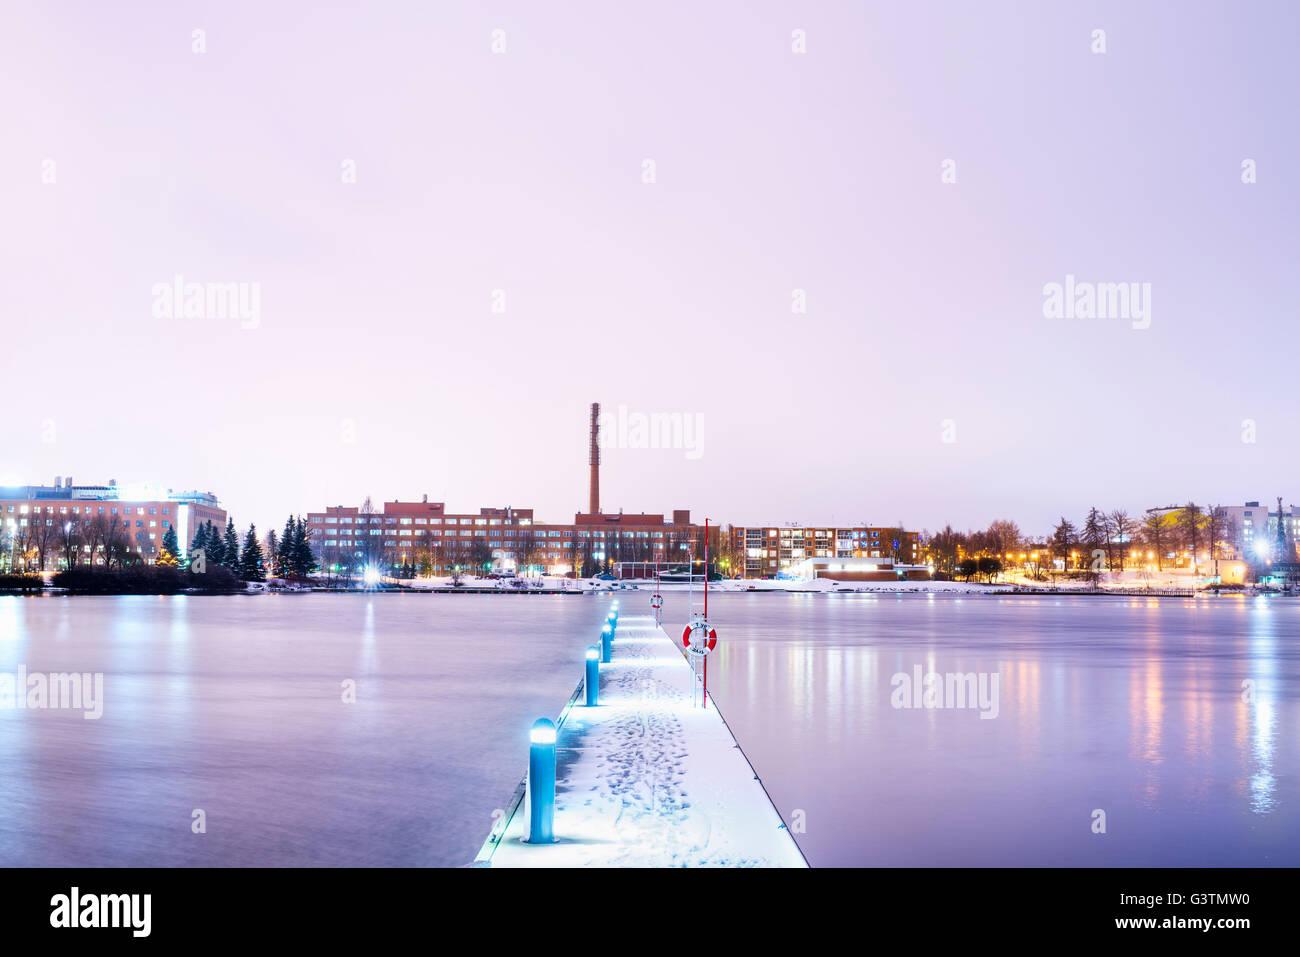 Finland, Pirkanmaa, Tampere, Pyhajarvi, Illuminated pier over lake at dusk - Stock Image